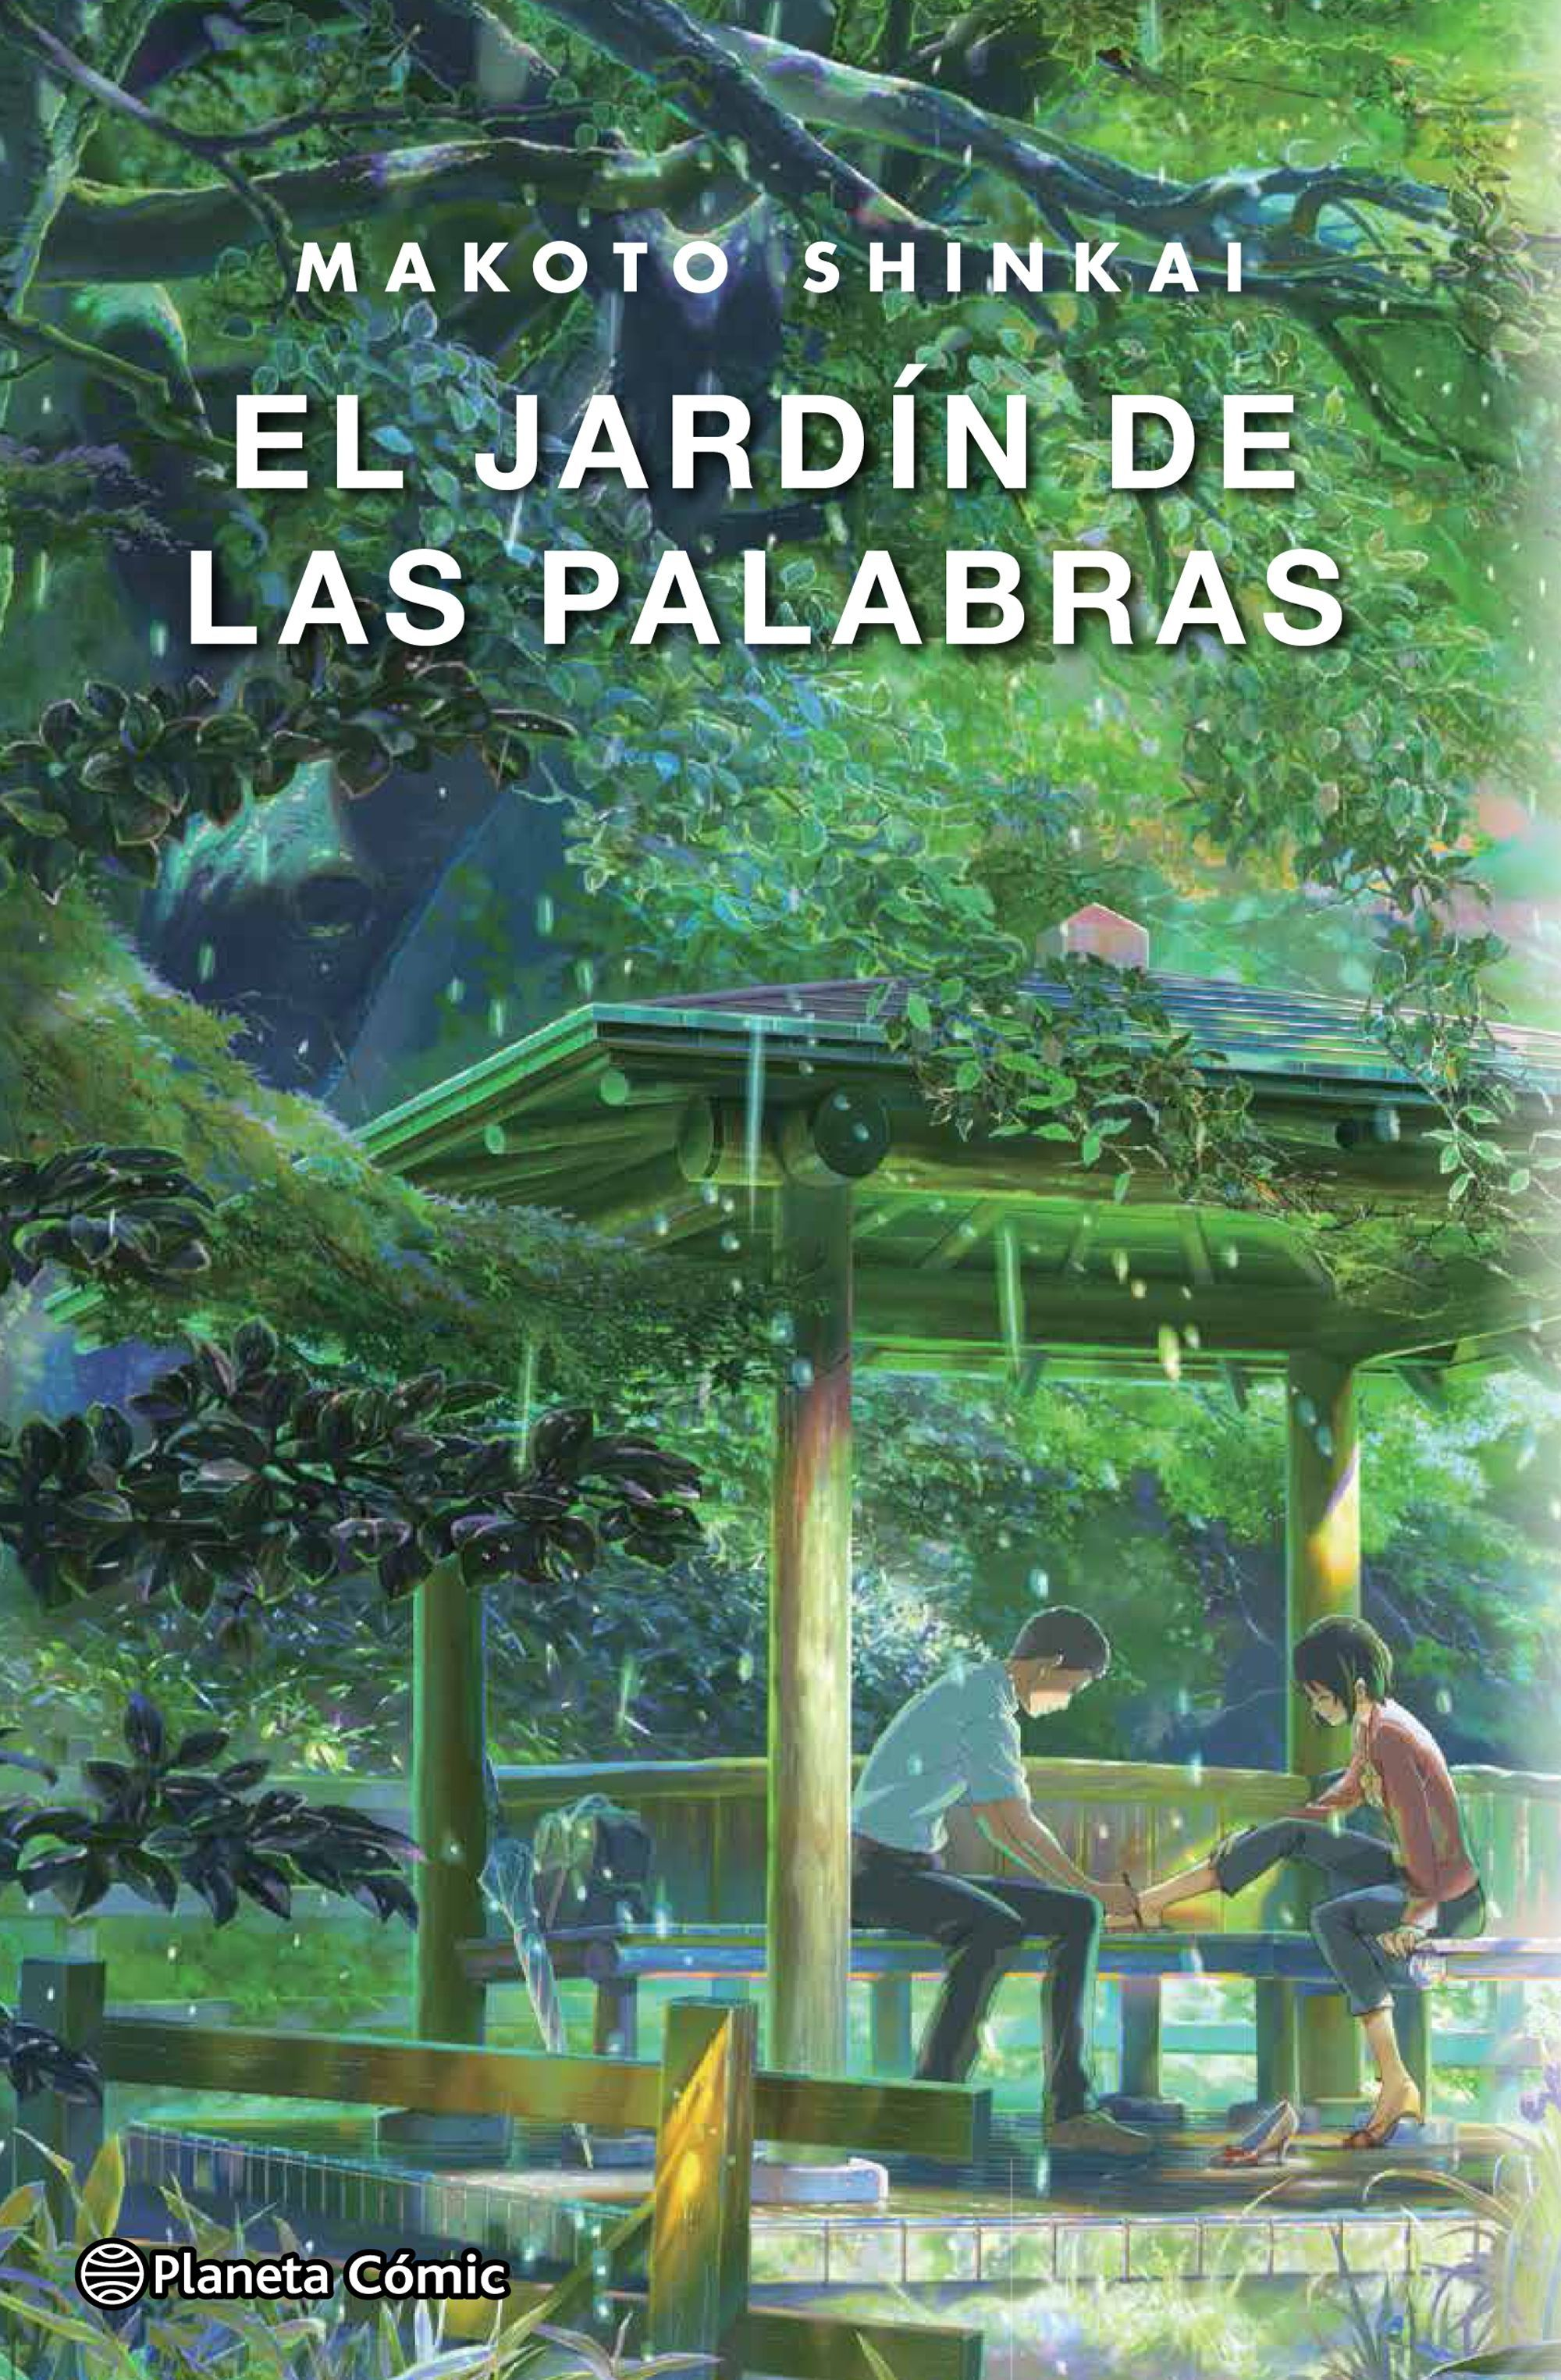 El Jardin De Las Palabras Novela Makoto Shinkai Numero De Paginas 392 Fecha De Publicacion 16 Jardin De Las Palabras Diseno De Jardin Japones Jardines